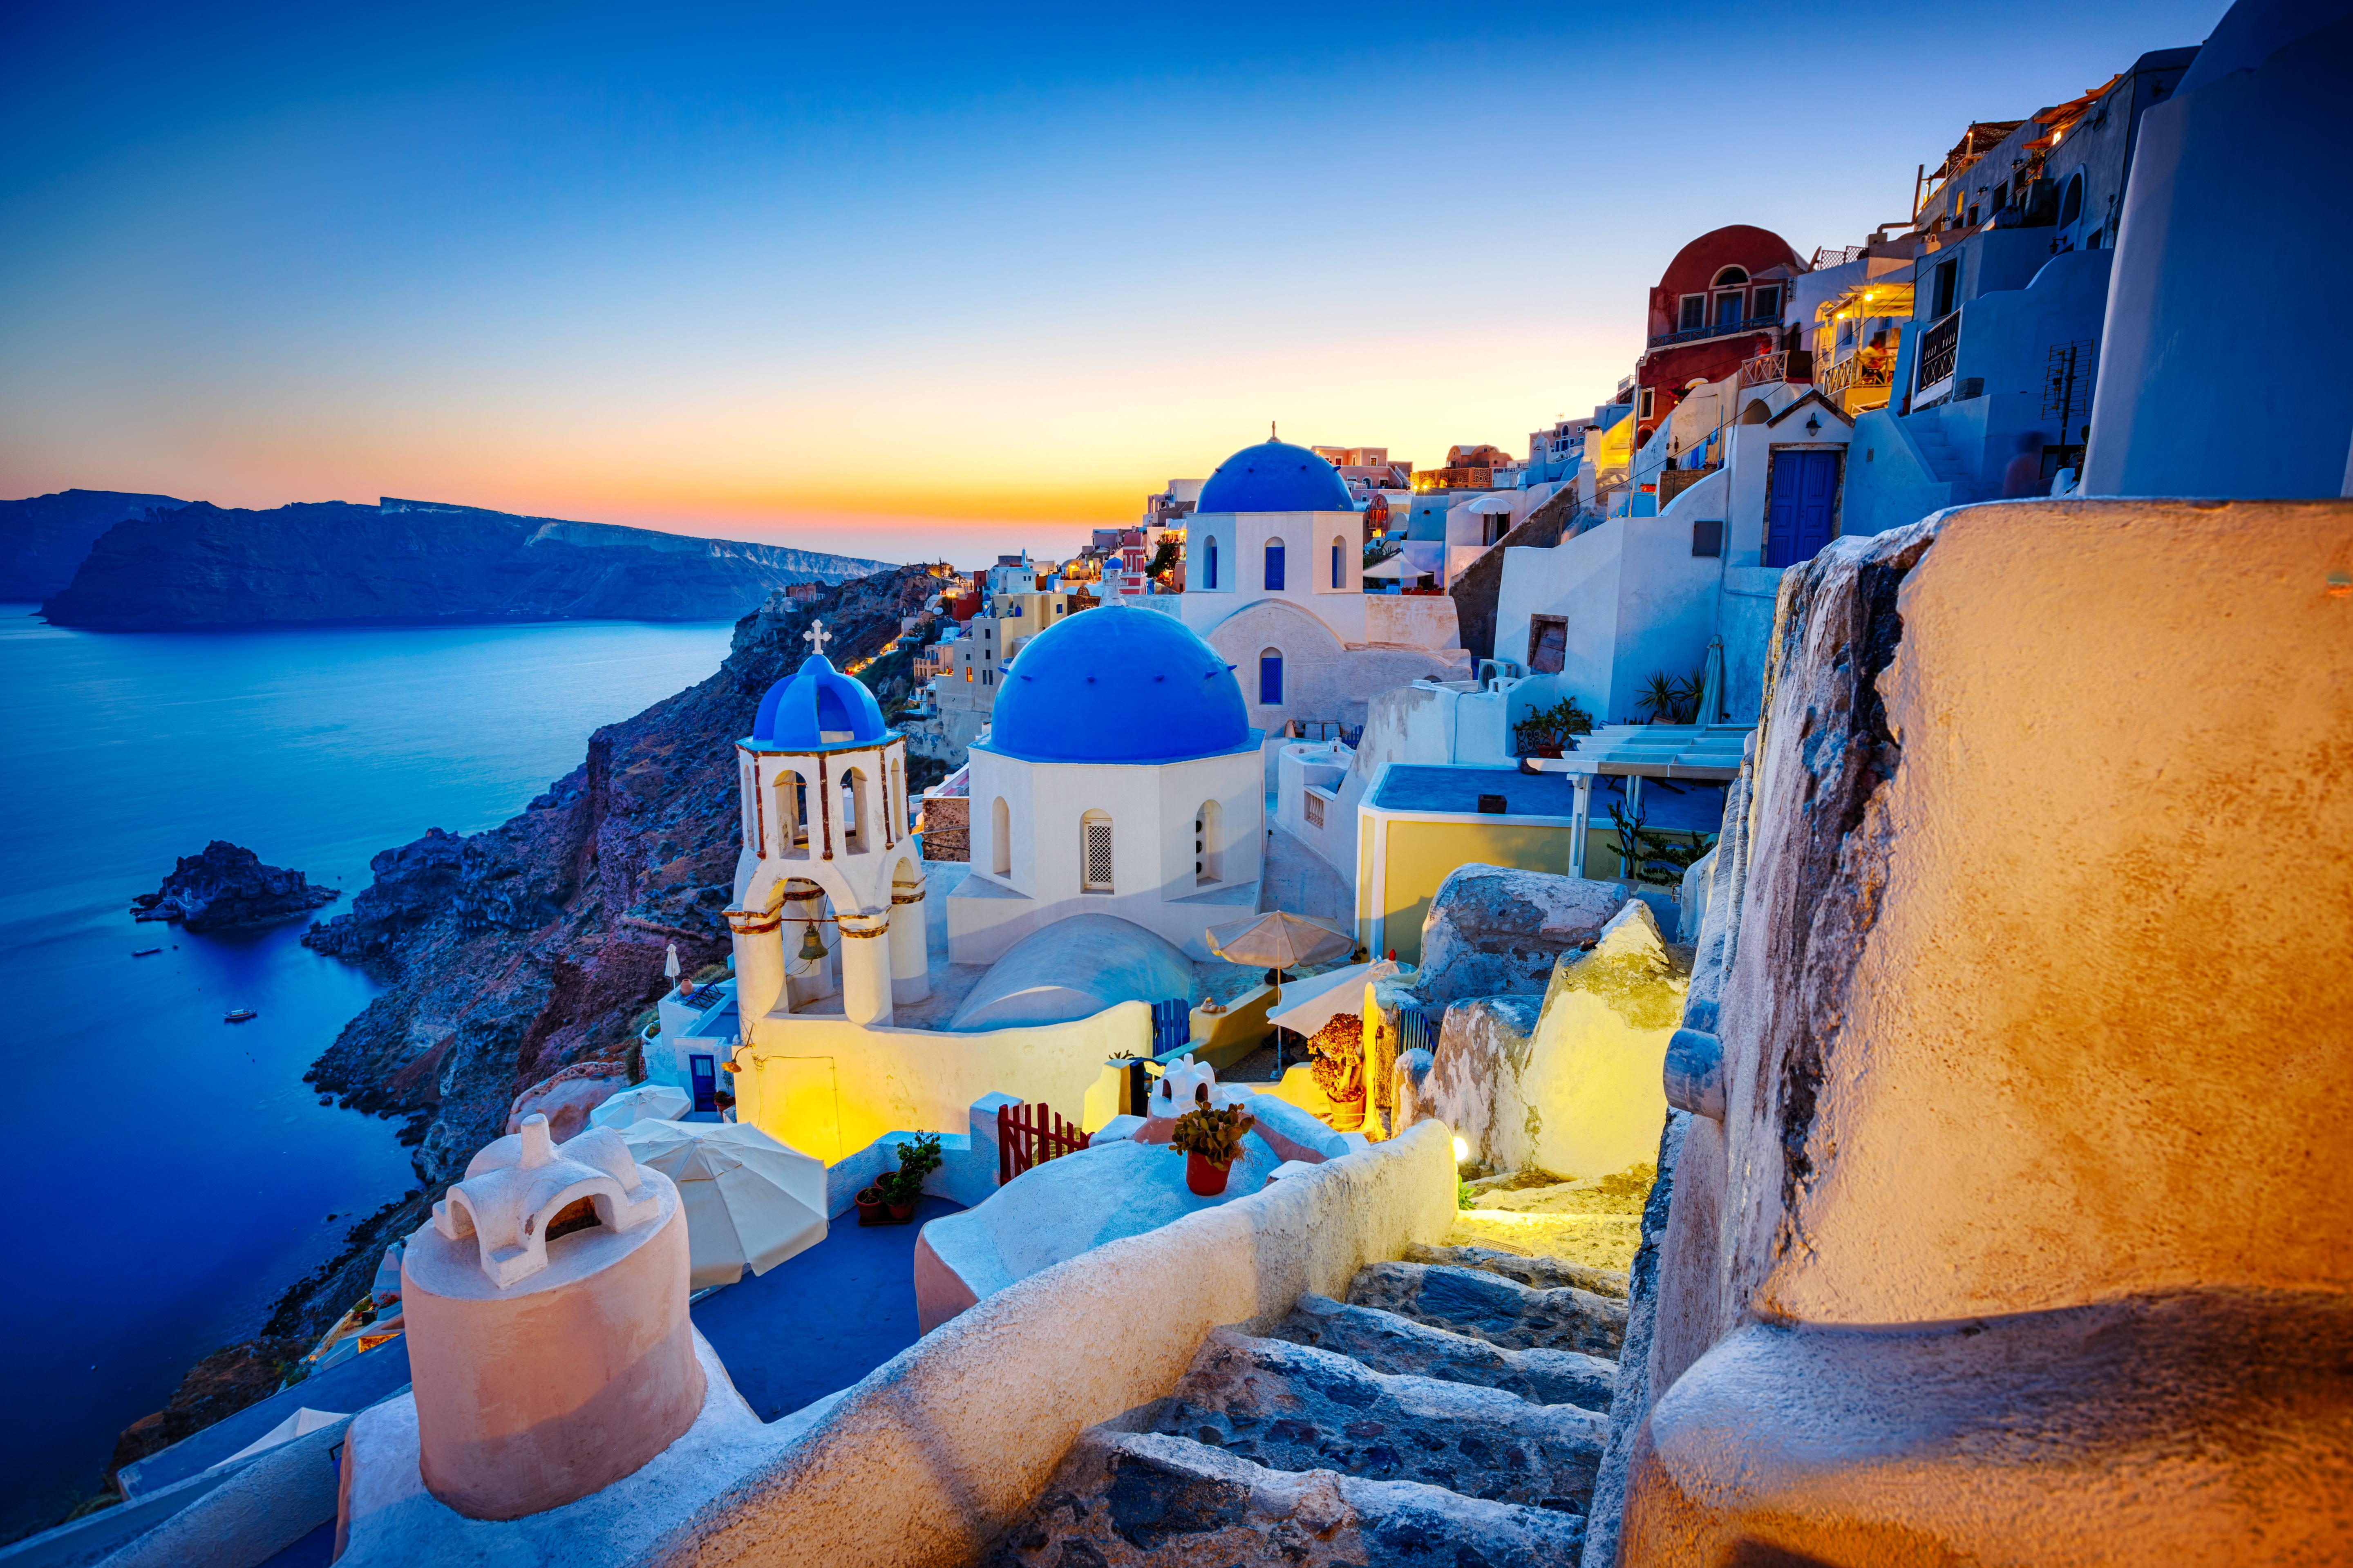 Romantic travel destination Oia village, Santorini island, Greece